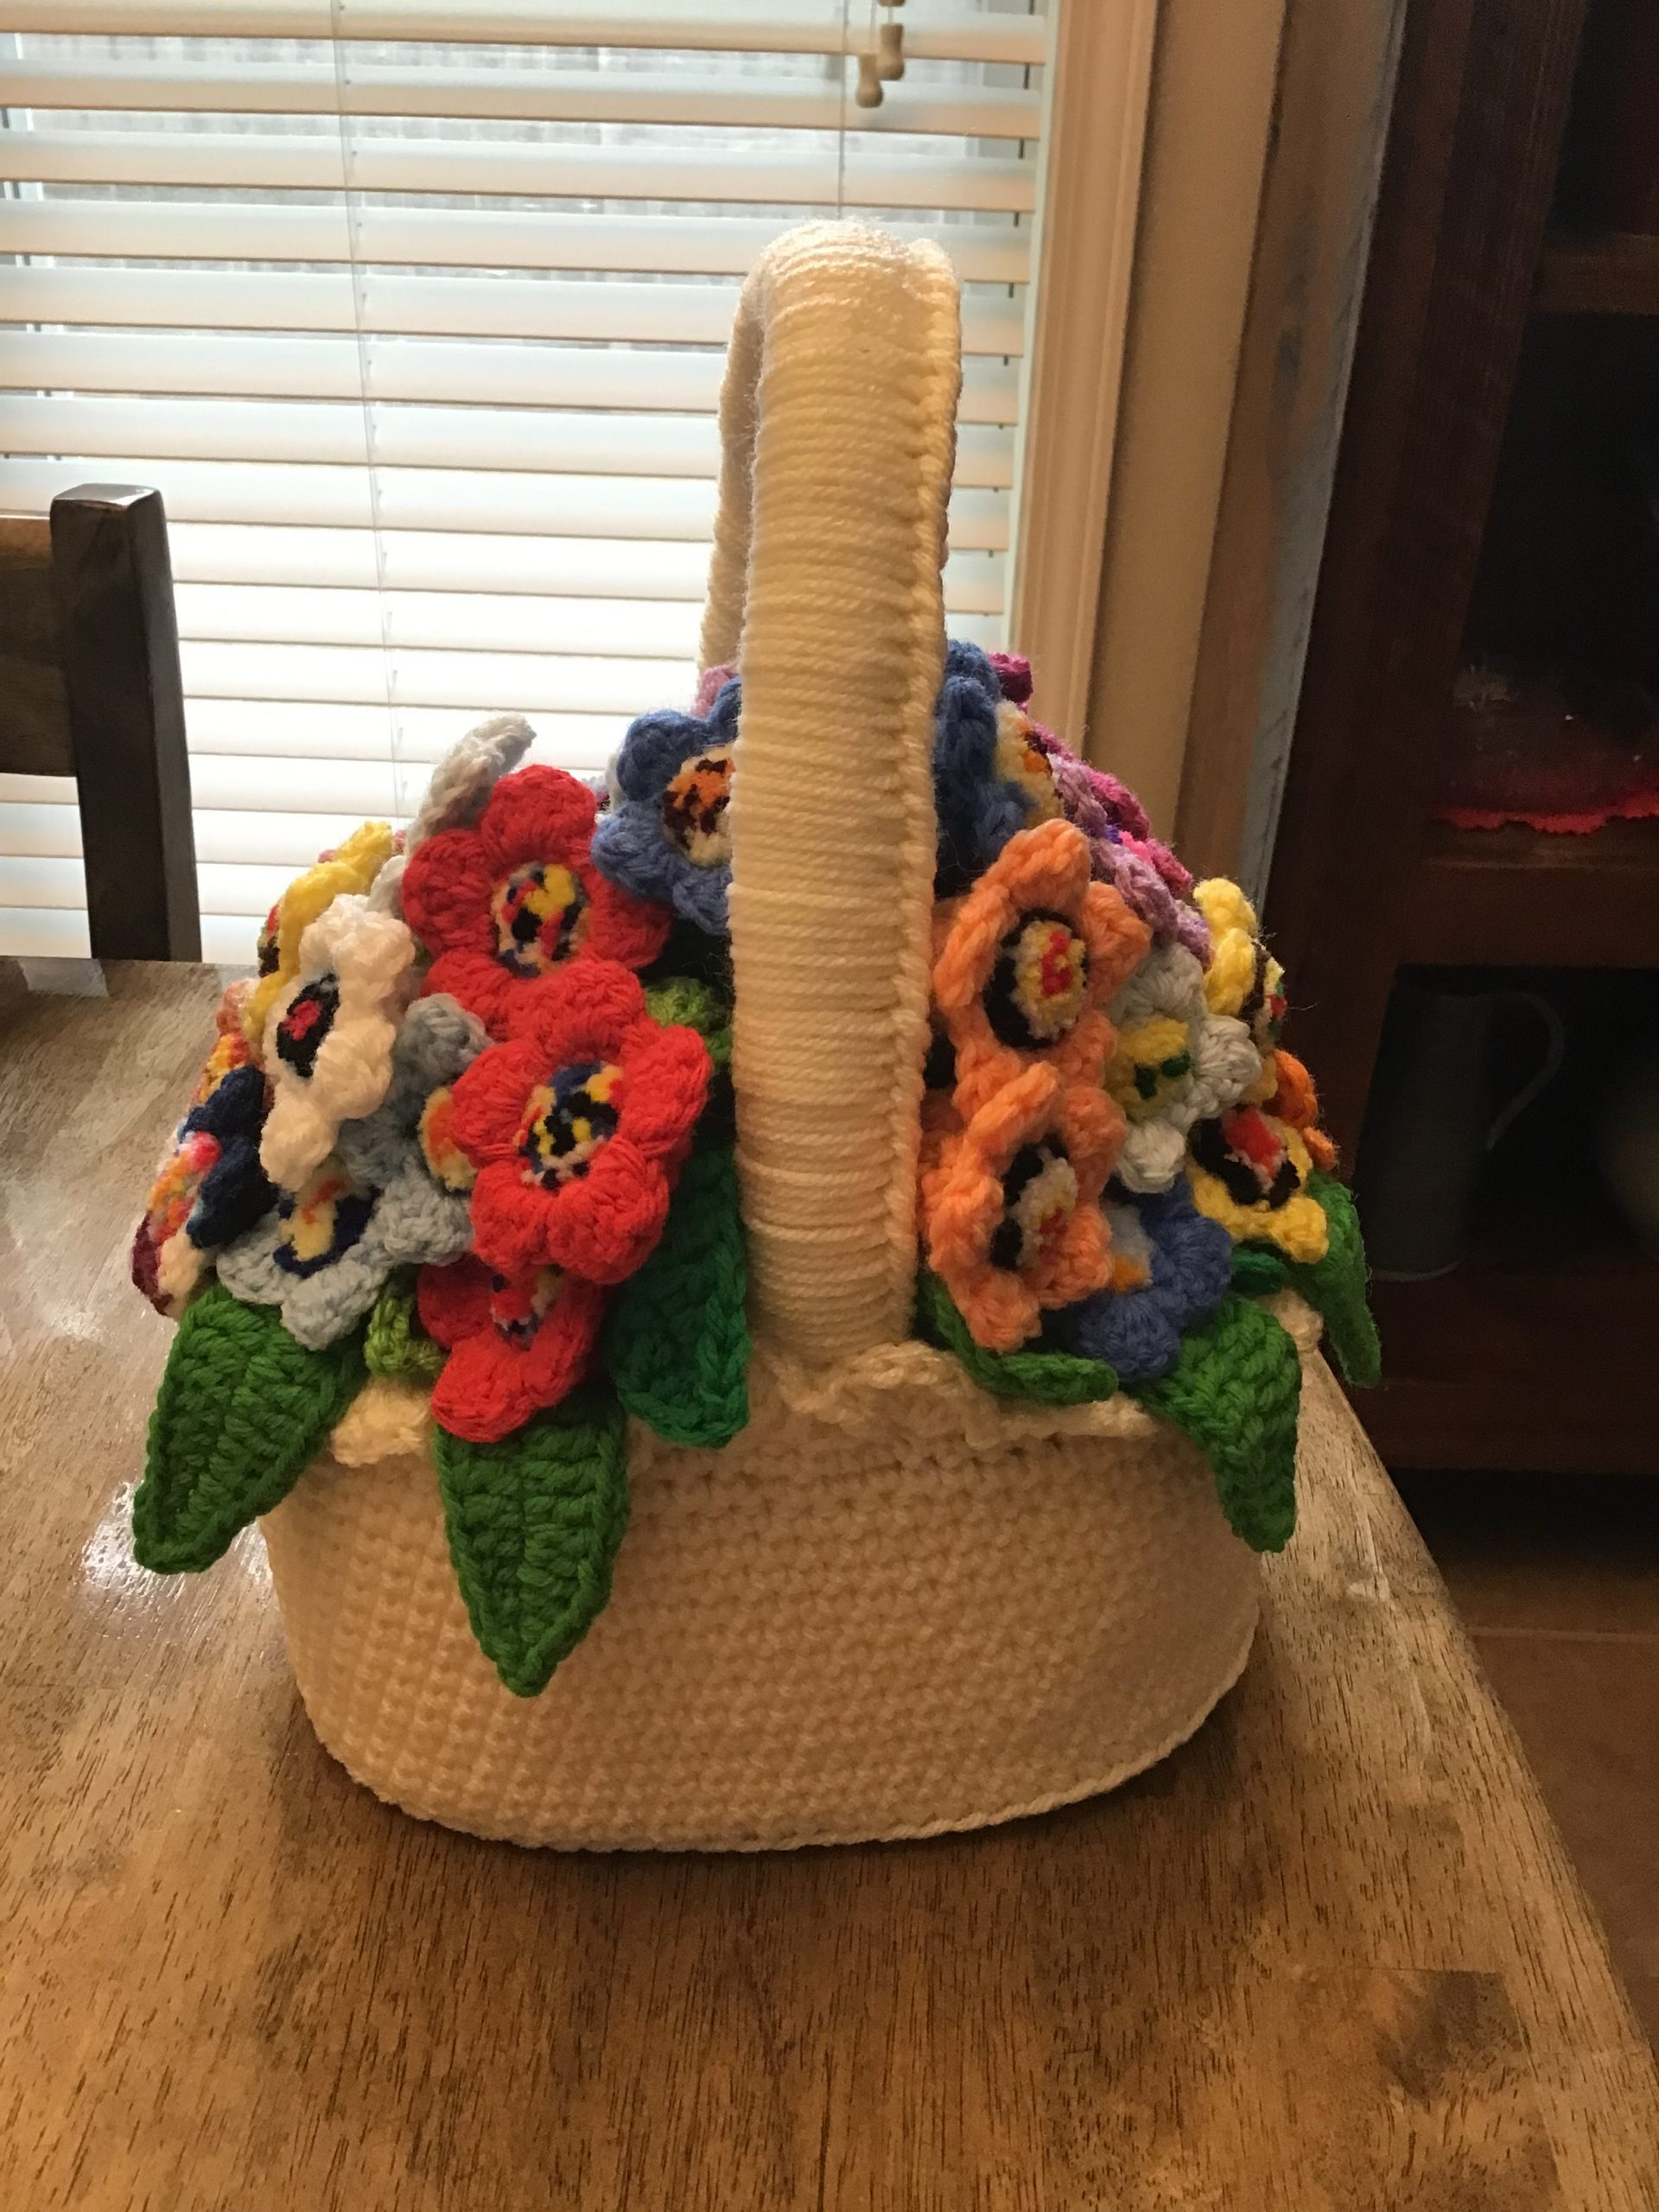 A soft basket of handmade flowers